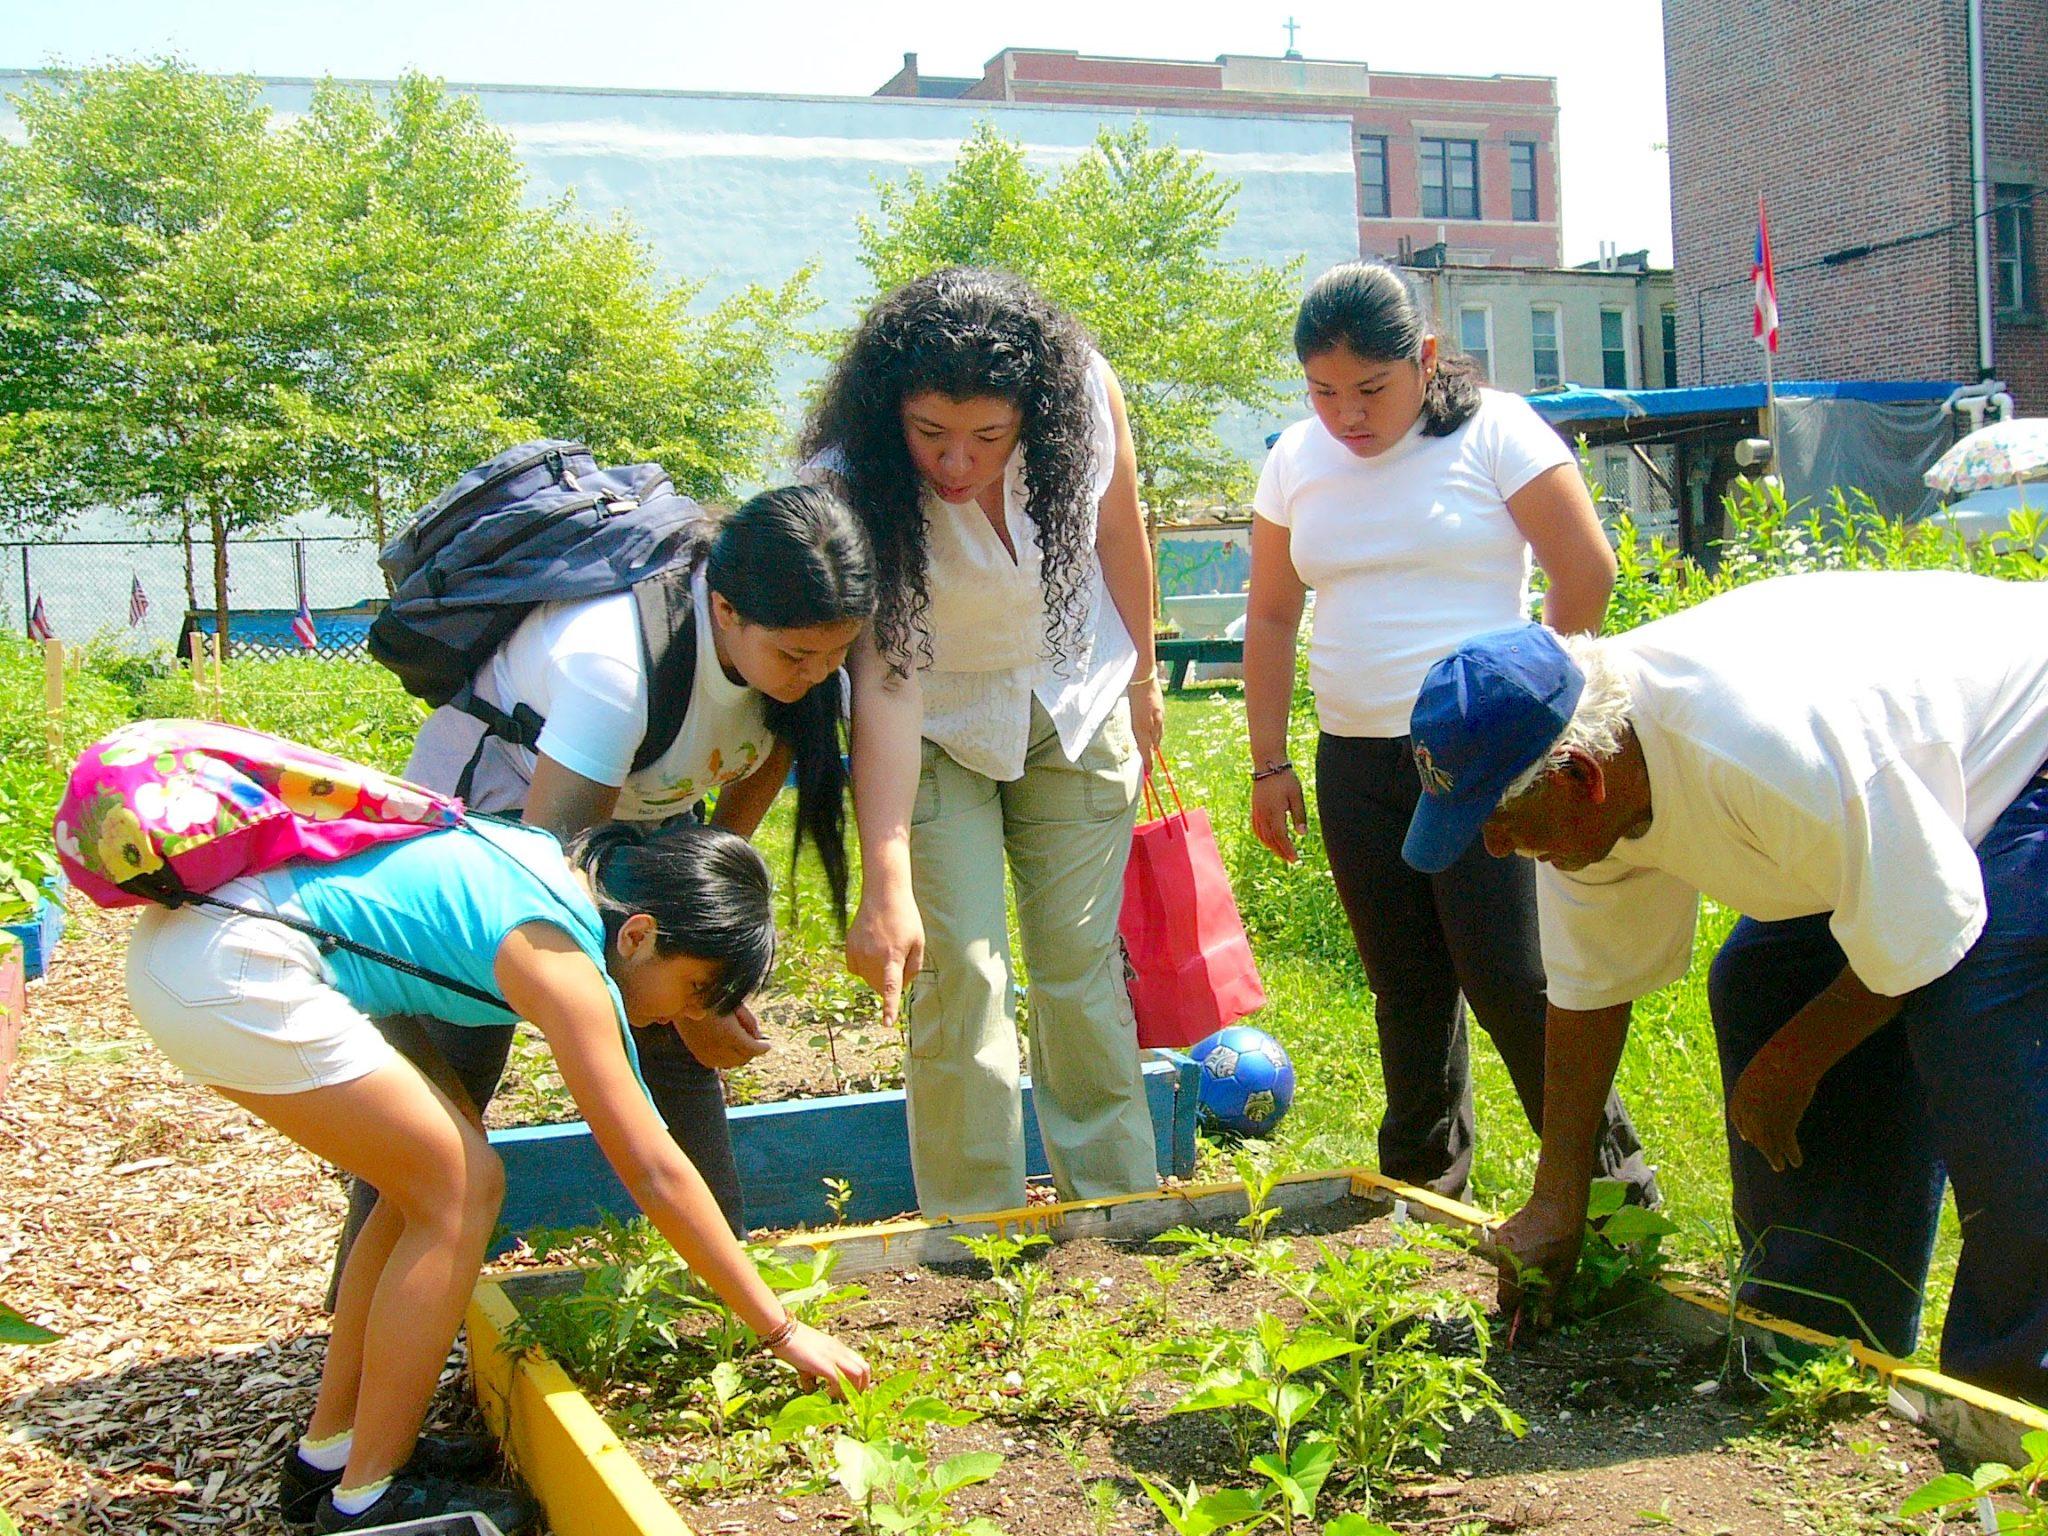 urban environmental education review the nature of cities intergenerational urban environmental education